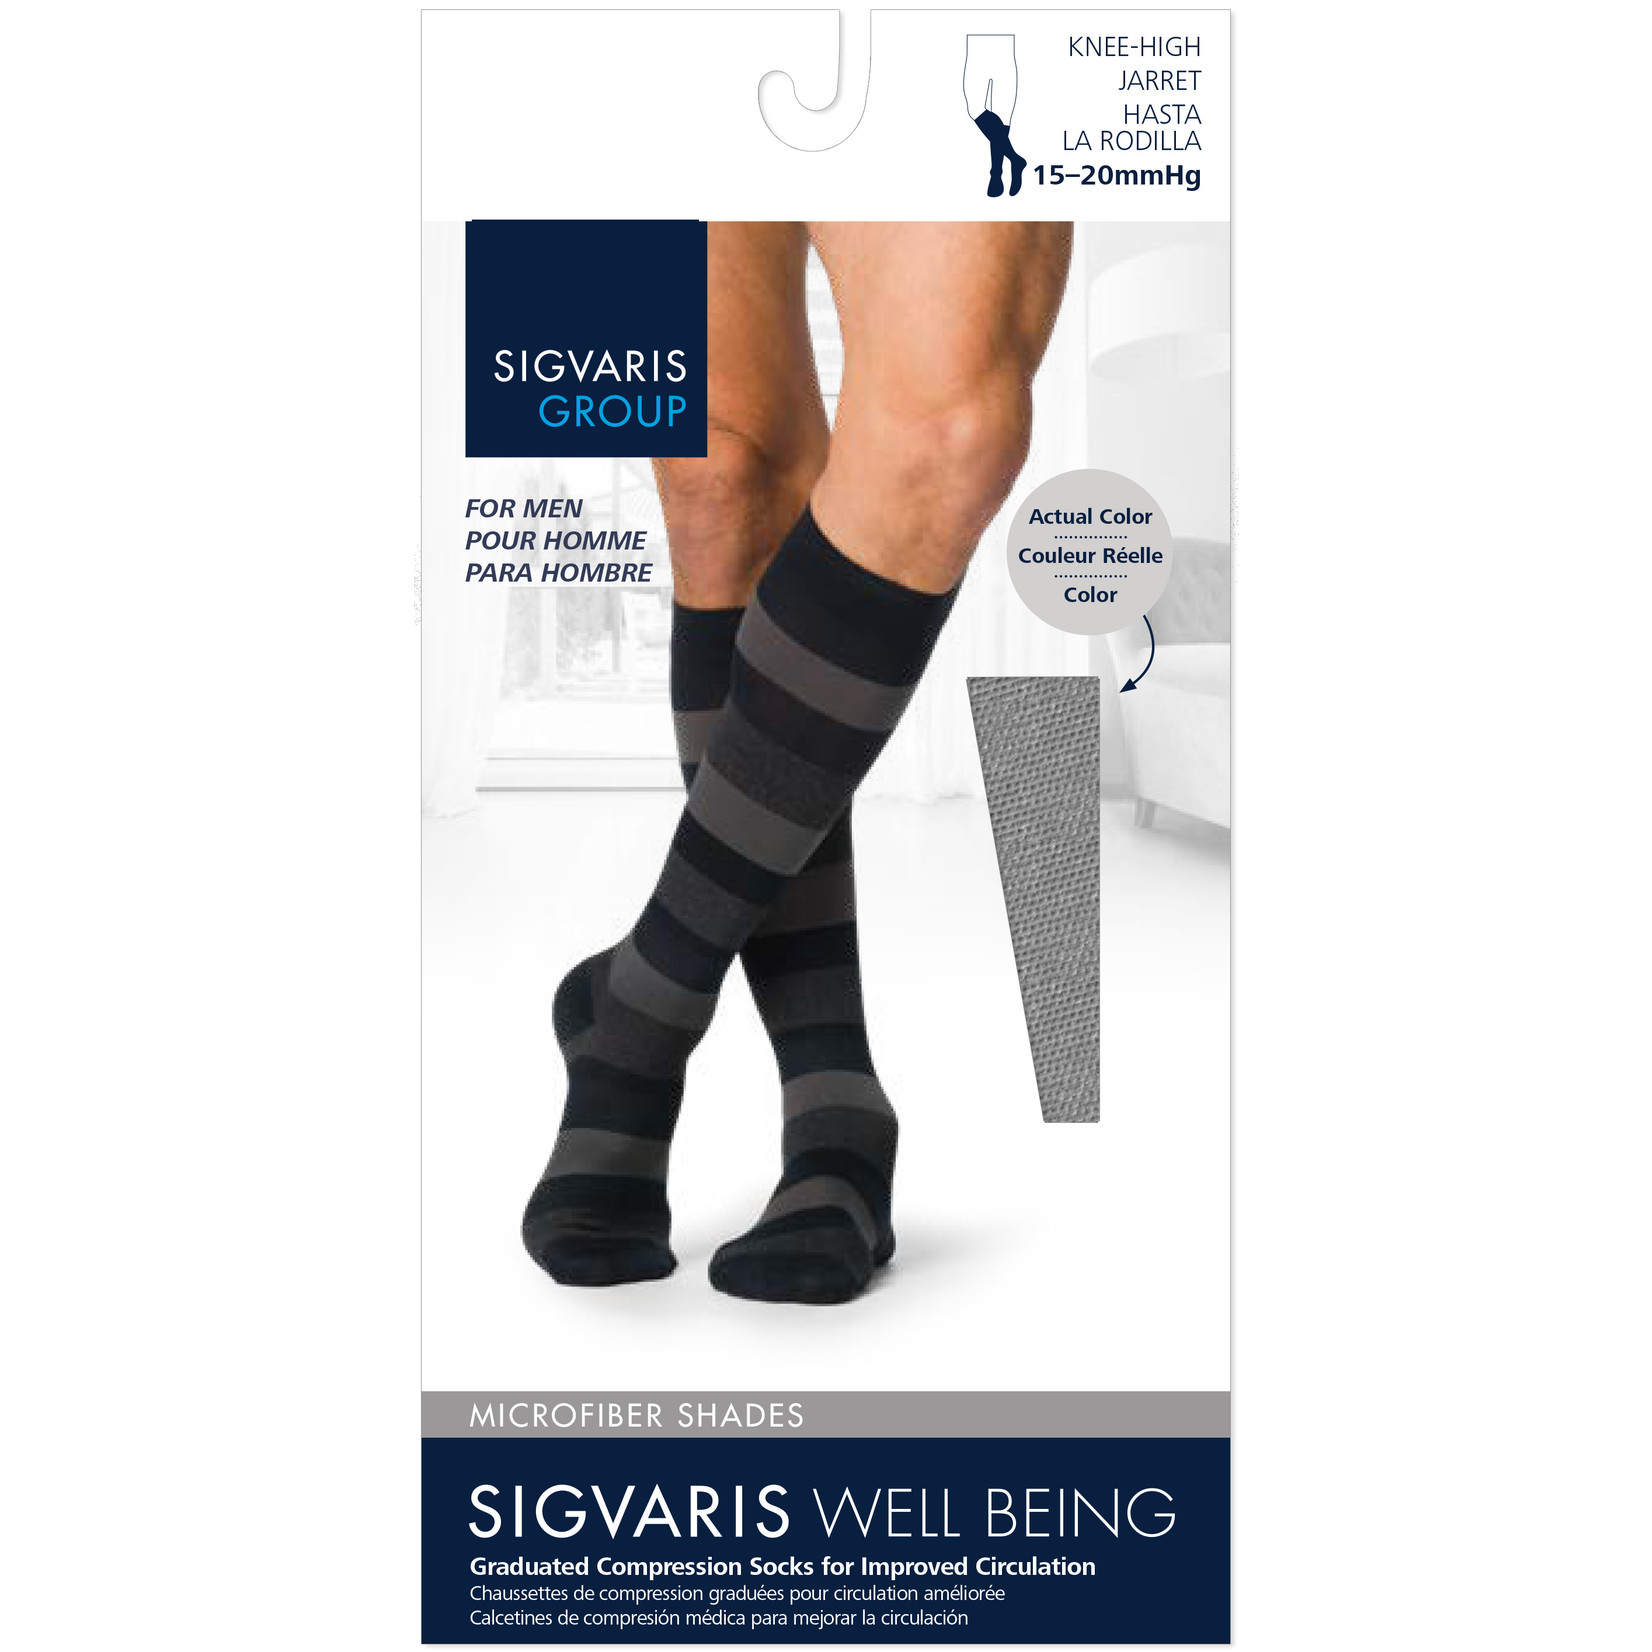 SIGVARIS Men's Microfiber Shades Calf 15-20mmHg